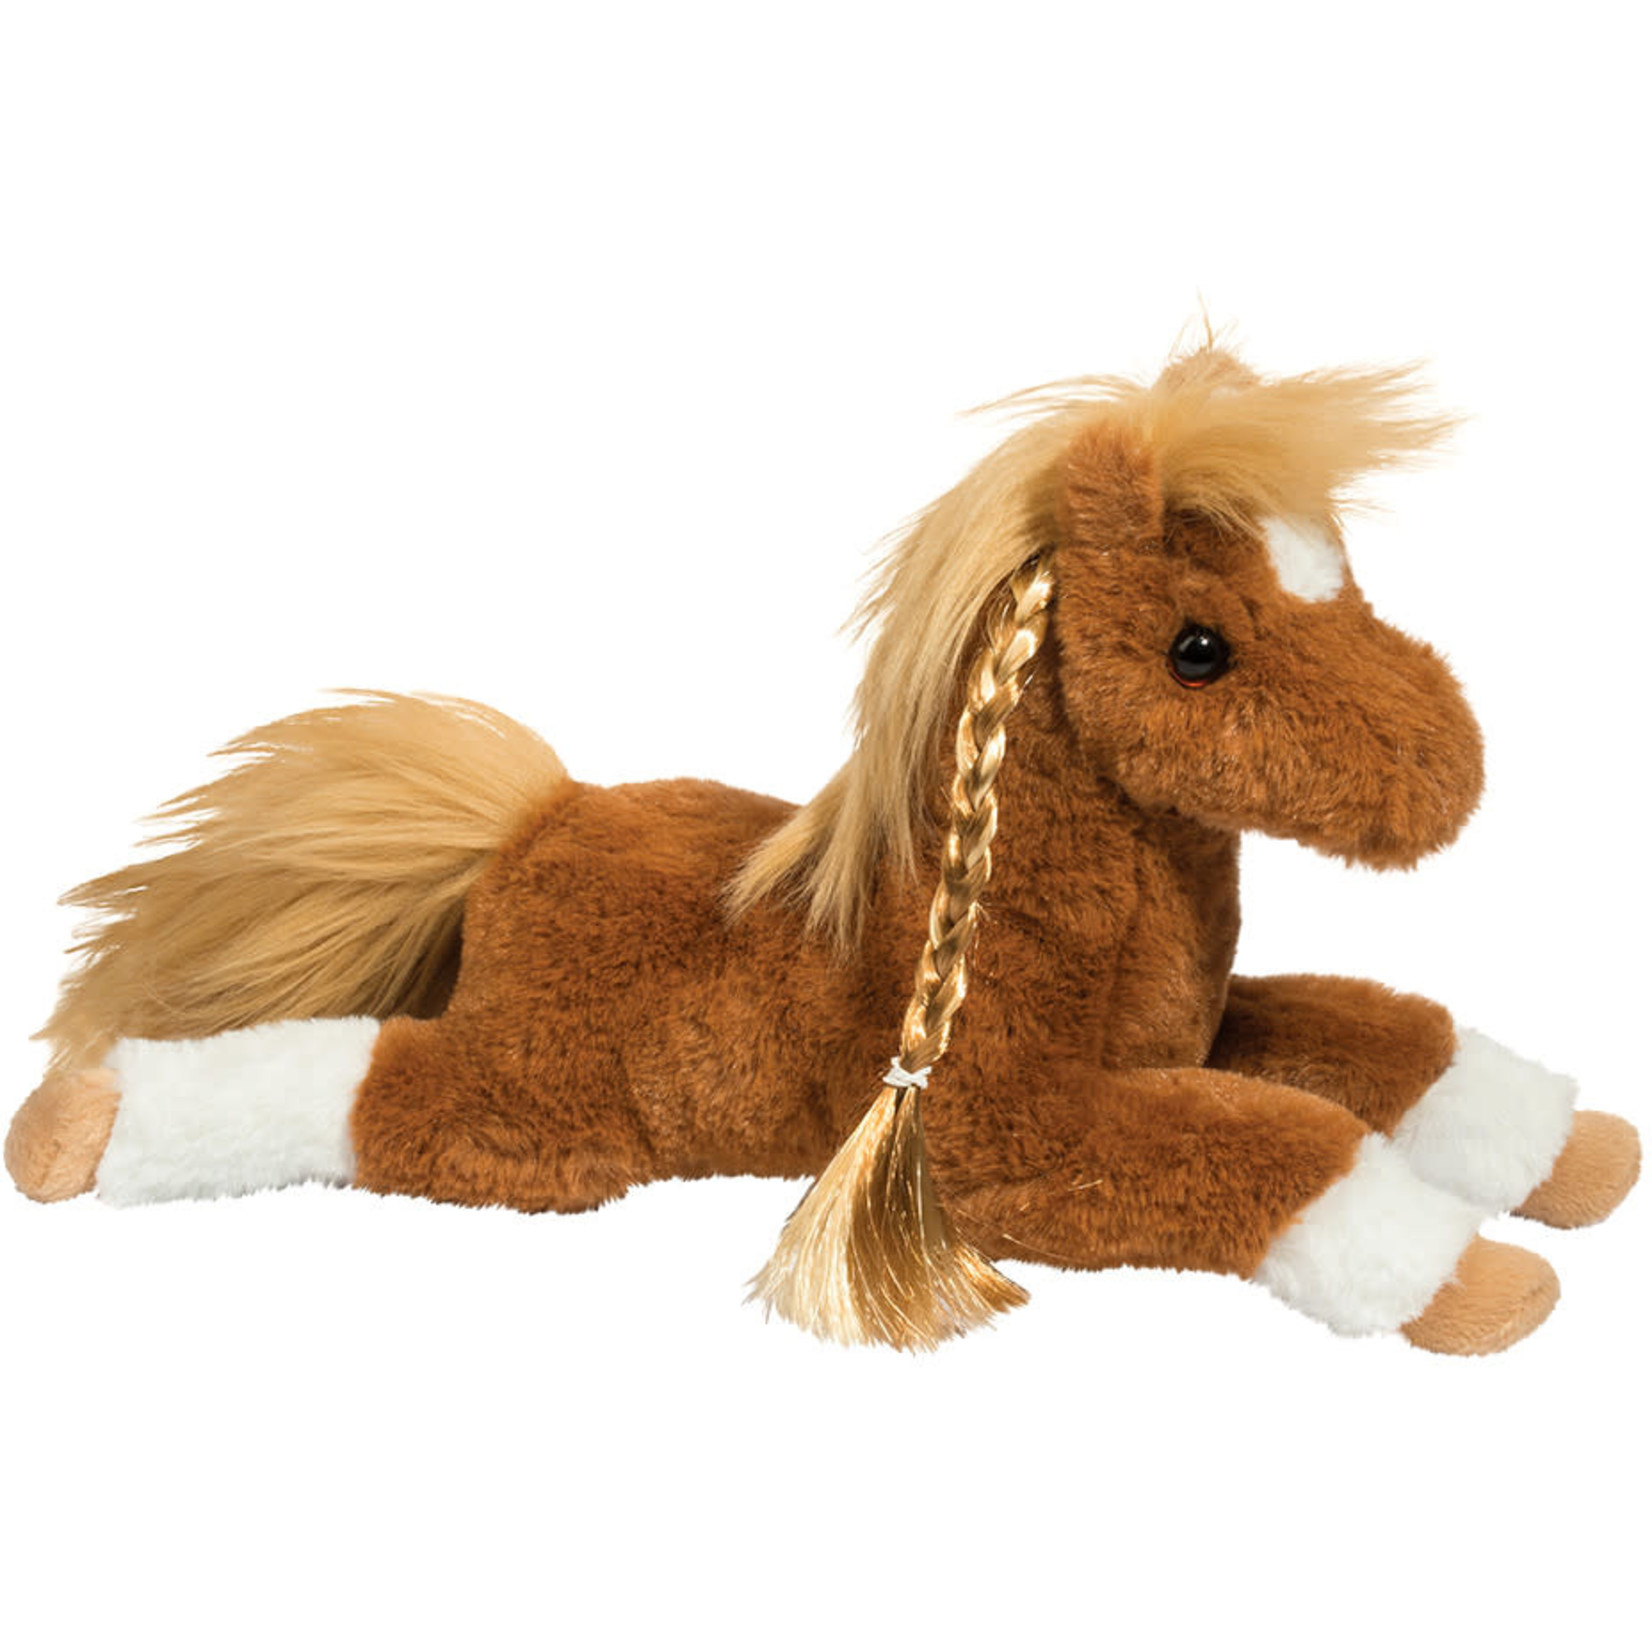 DOUGLAS KENA CHESTNUT HORSE